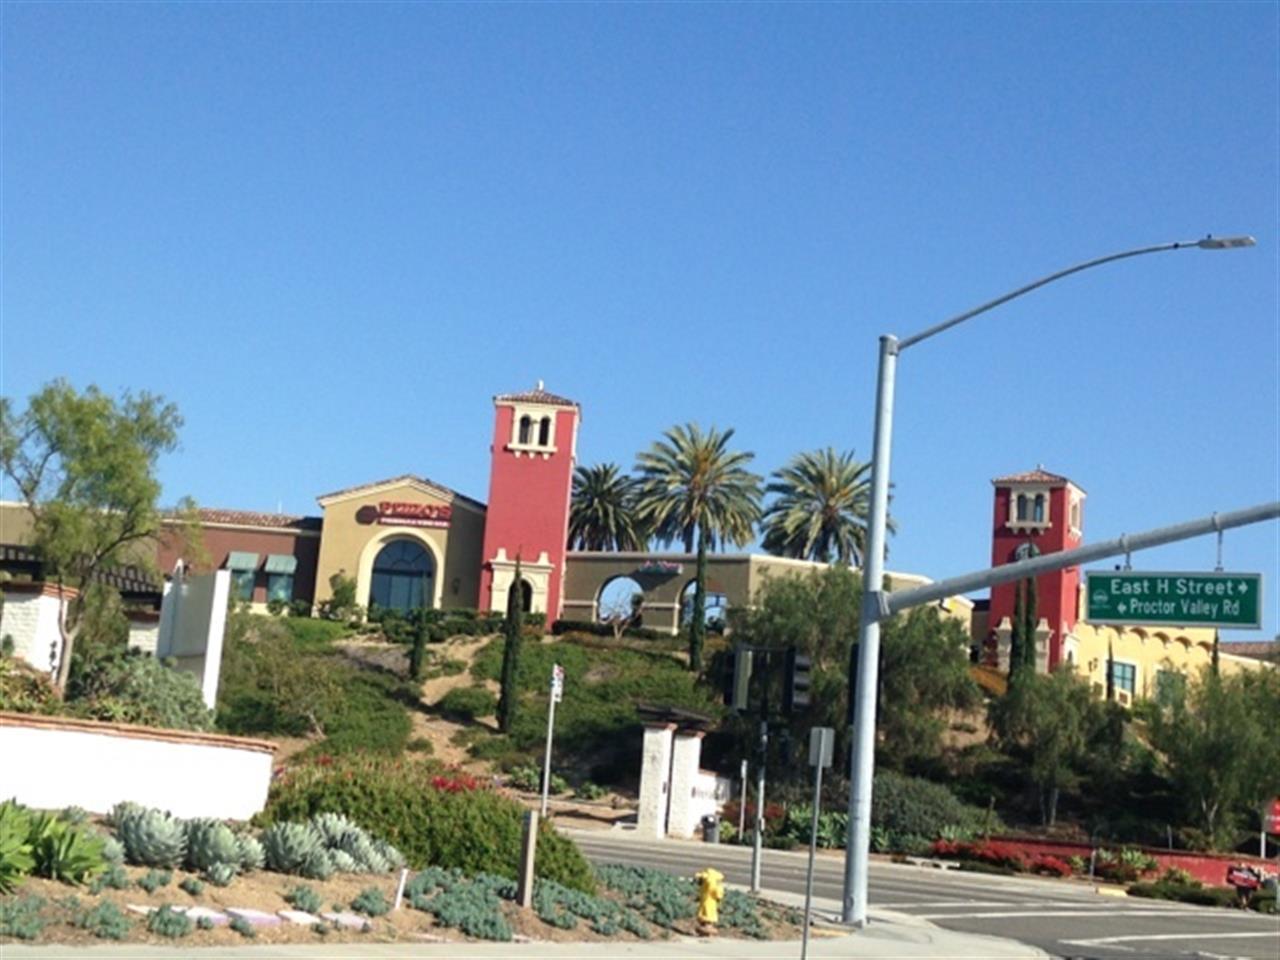 #Chula Vista #San Miguel Shopping #LeadingRElocal